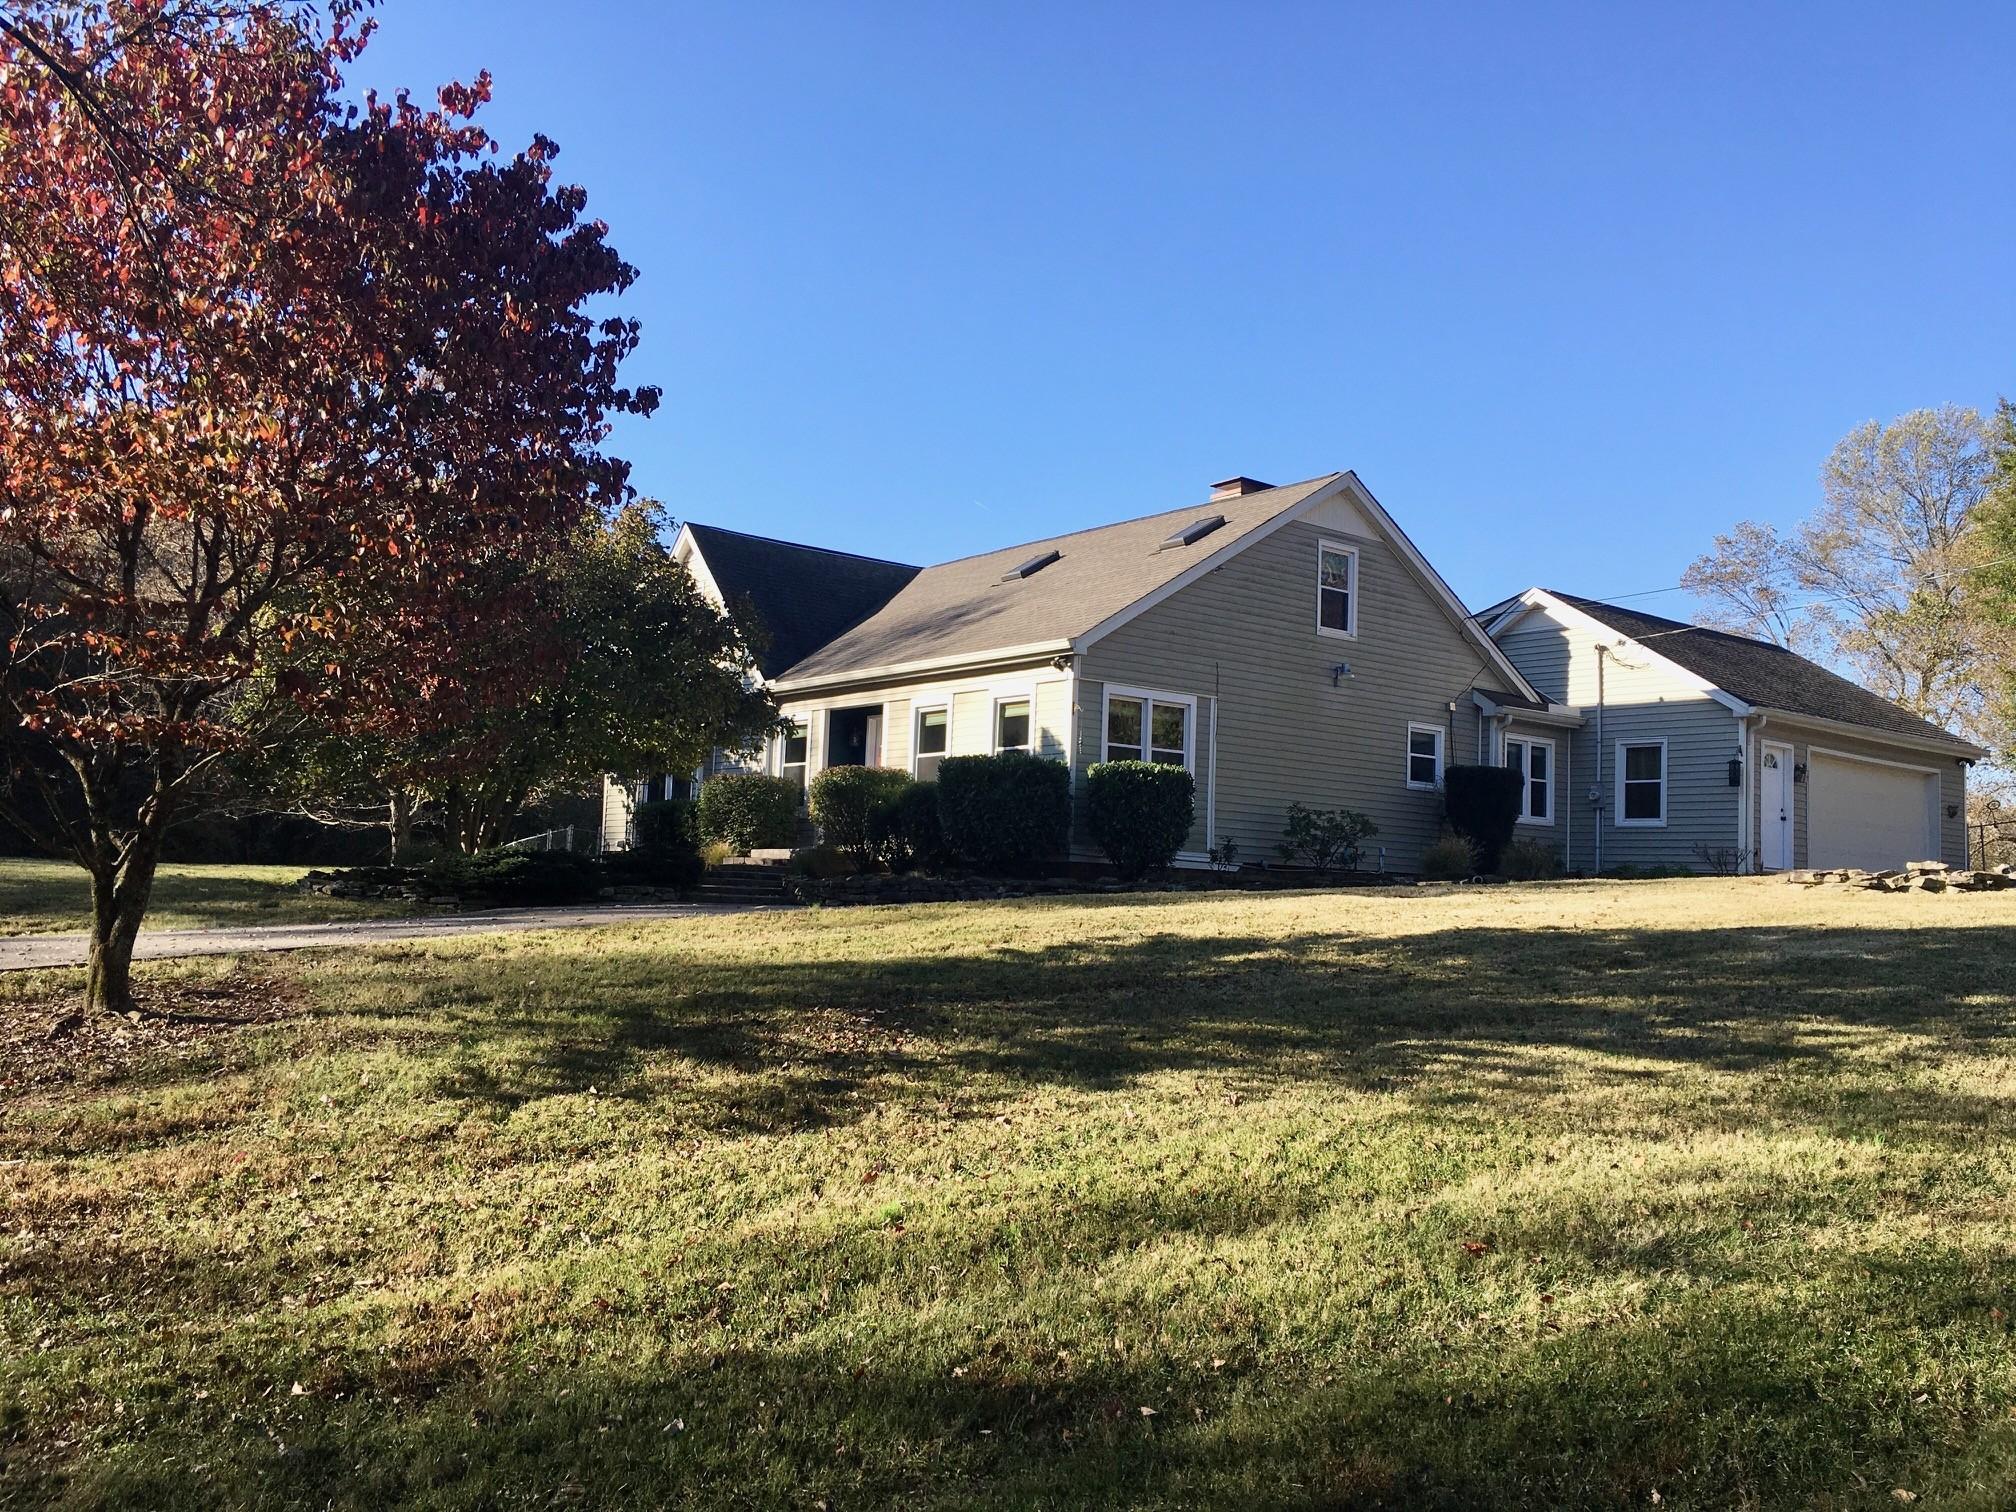 4628 Brick Church Pike, Goodlettsville, TN 37072 - Goodlettsville, TN real estate listing